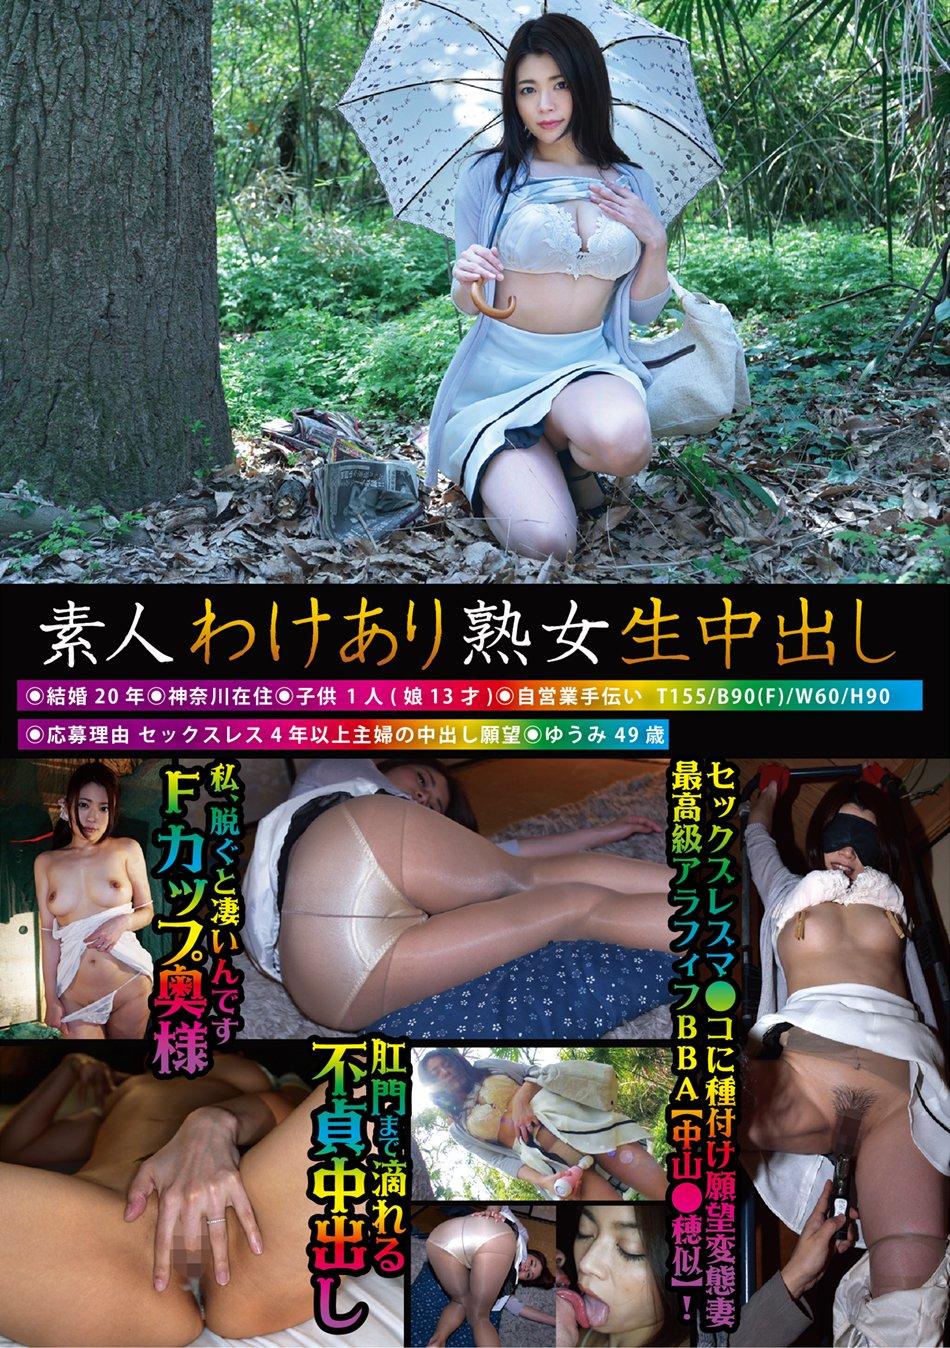 "cdx web.archive iv.83net.jp porno 20"""